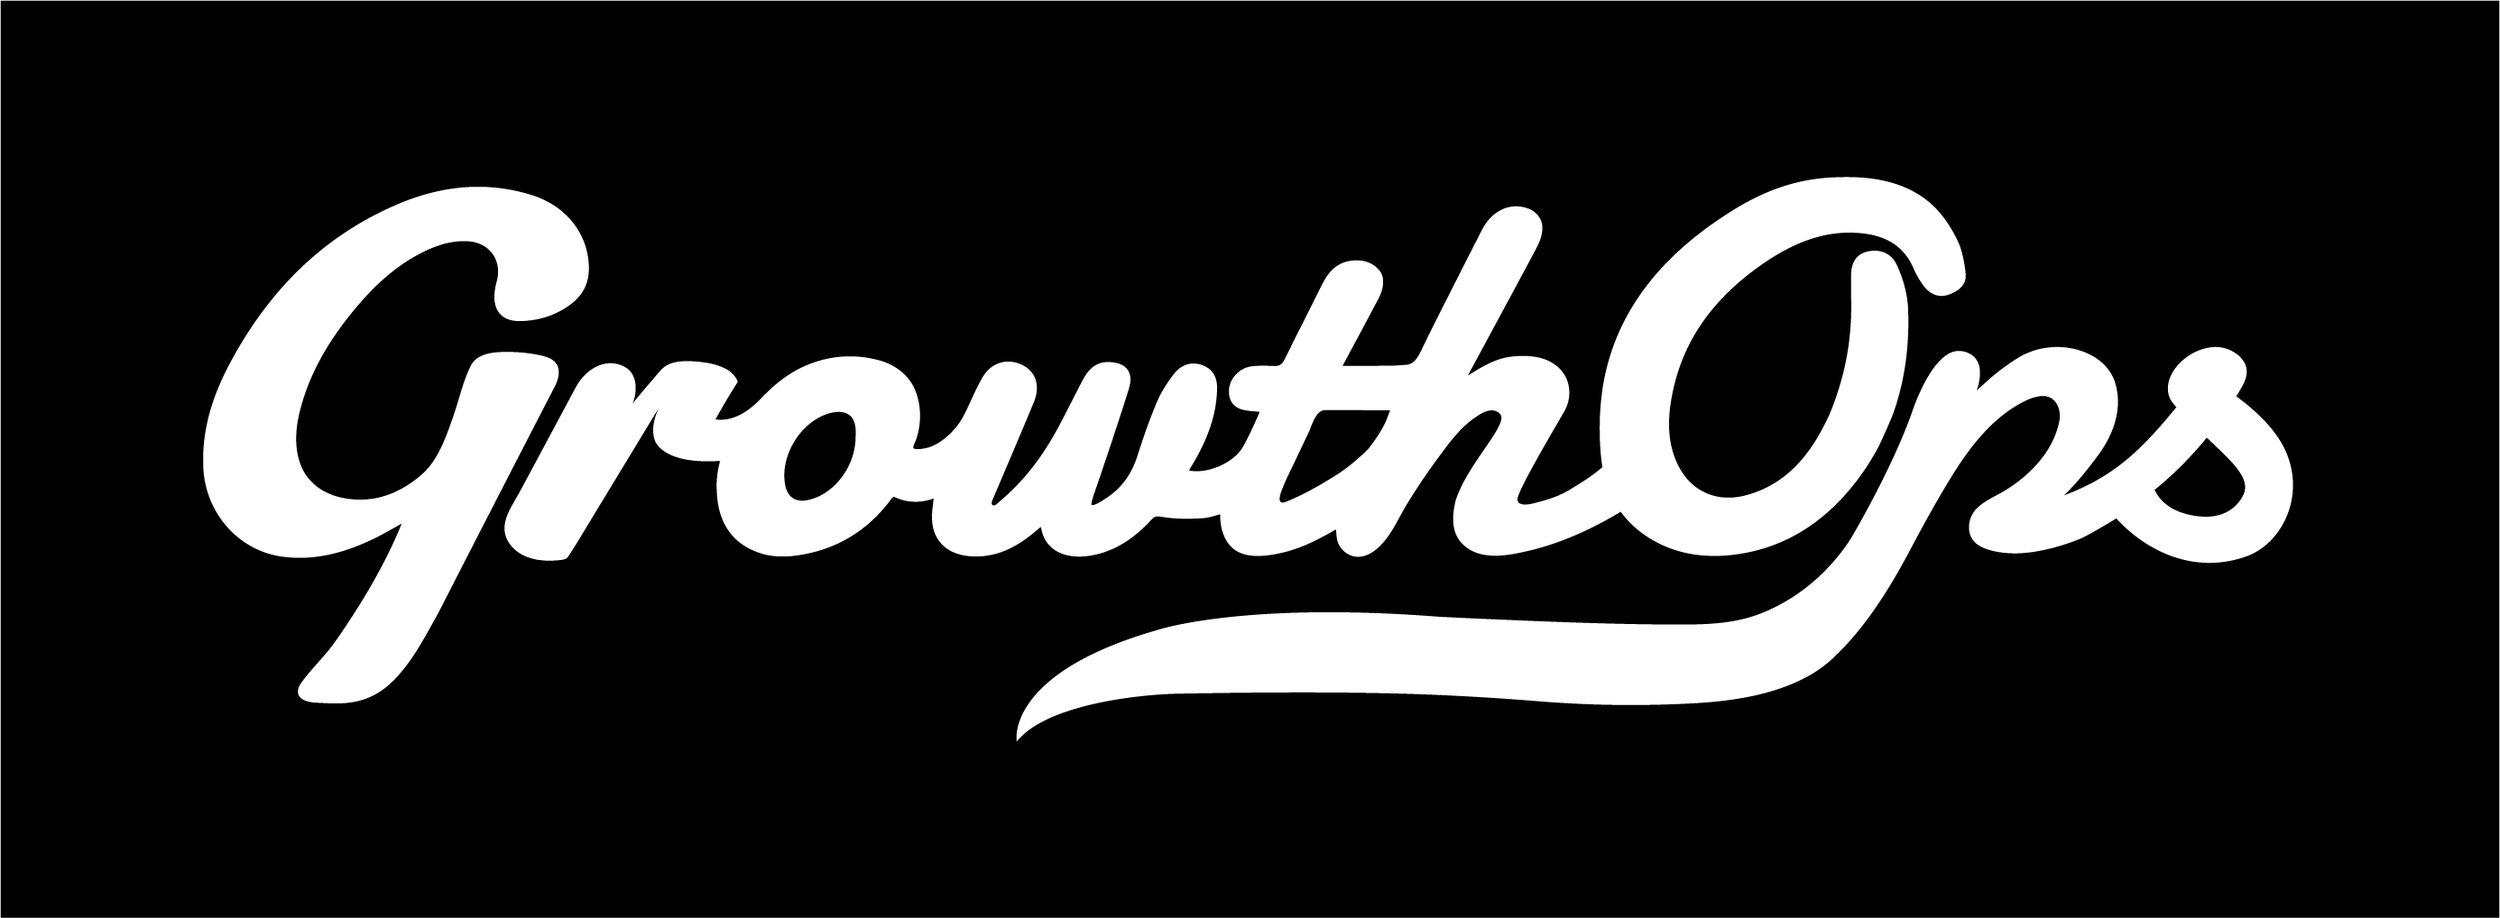 GrowthOps-Logo-Day-4-COSBOA-Innovation-Games.jpg